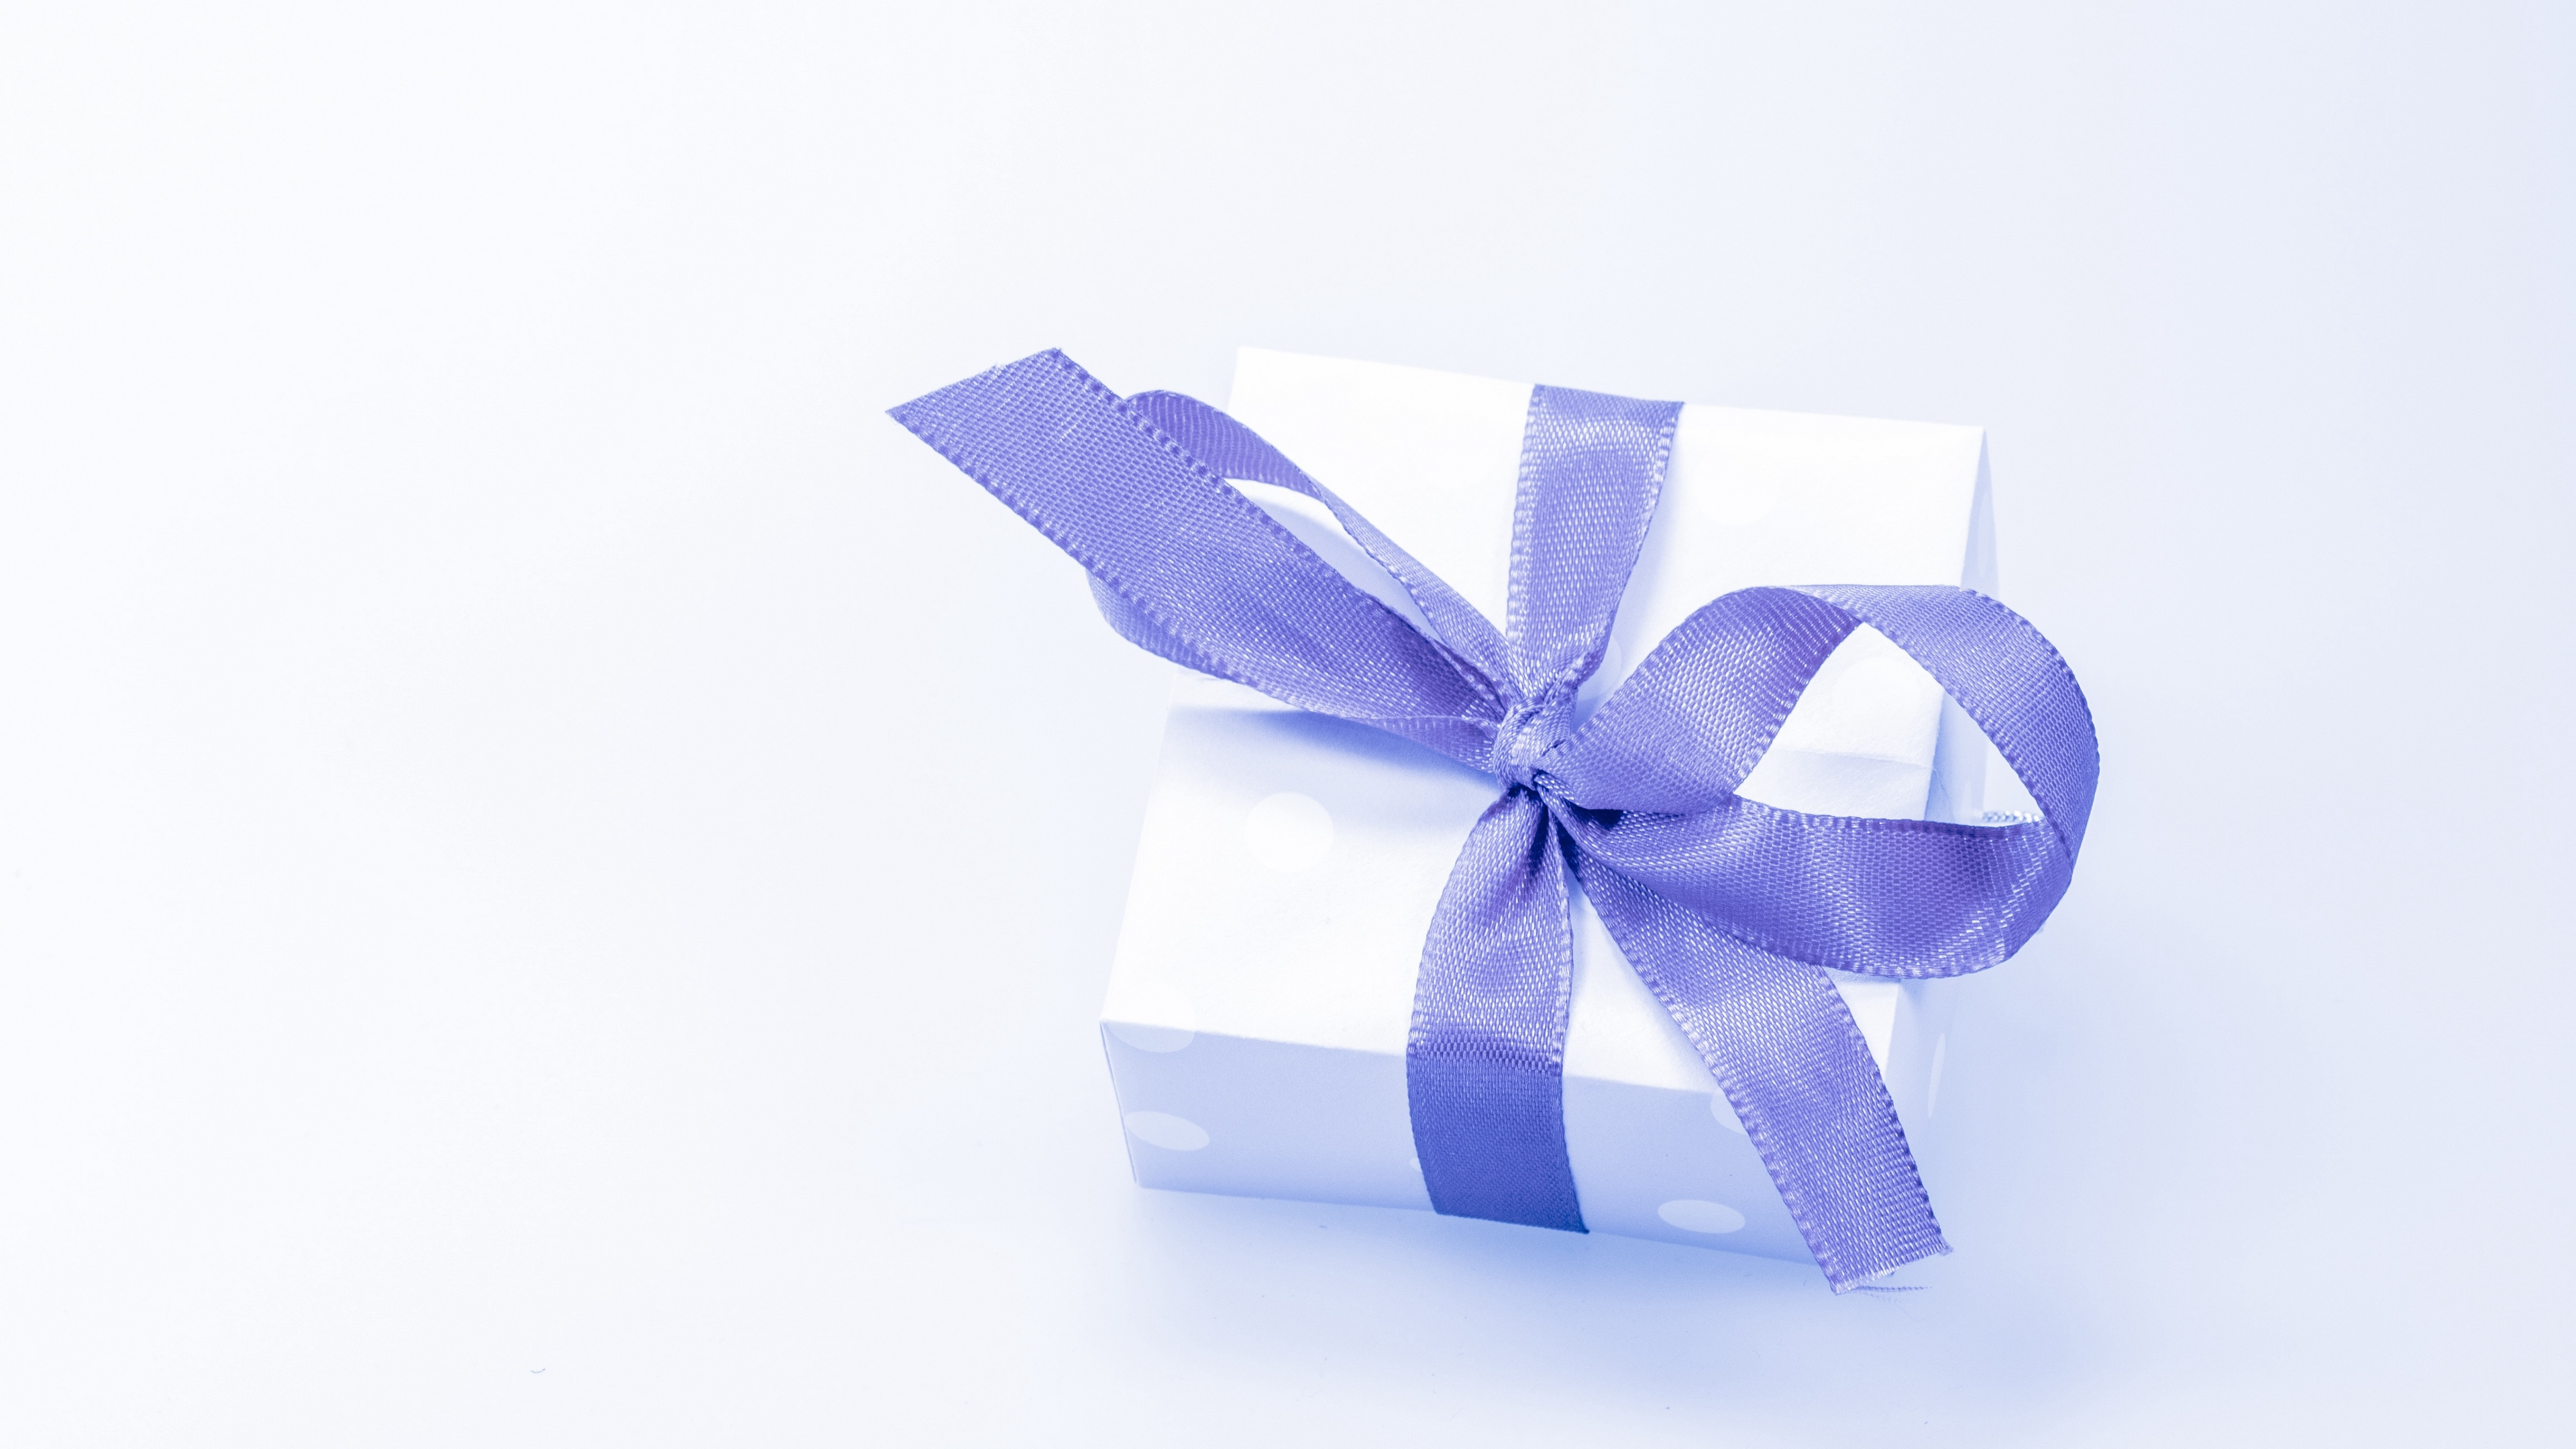 gift box bow packing 4k 1538344970 - gift, box, bow, packing 4k - Gift, box, bow